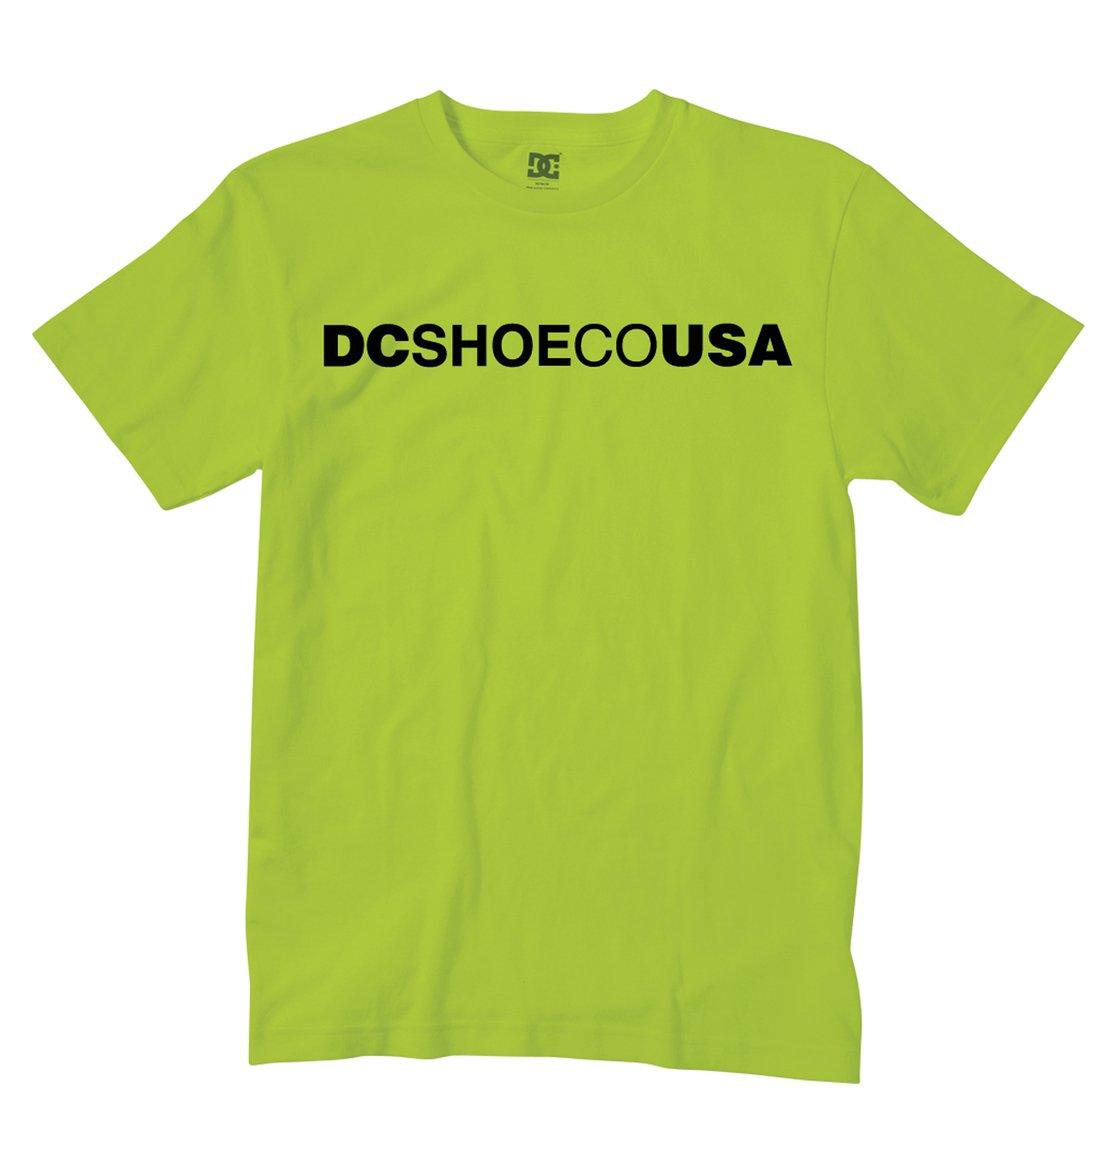 febb54a7a5f7 0 DCSHOECOUSA Tee 51200526 DC Shoes